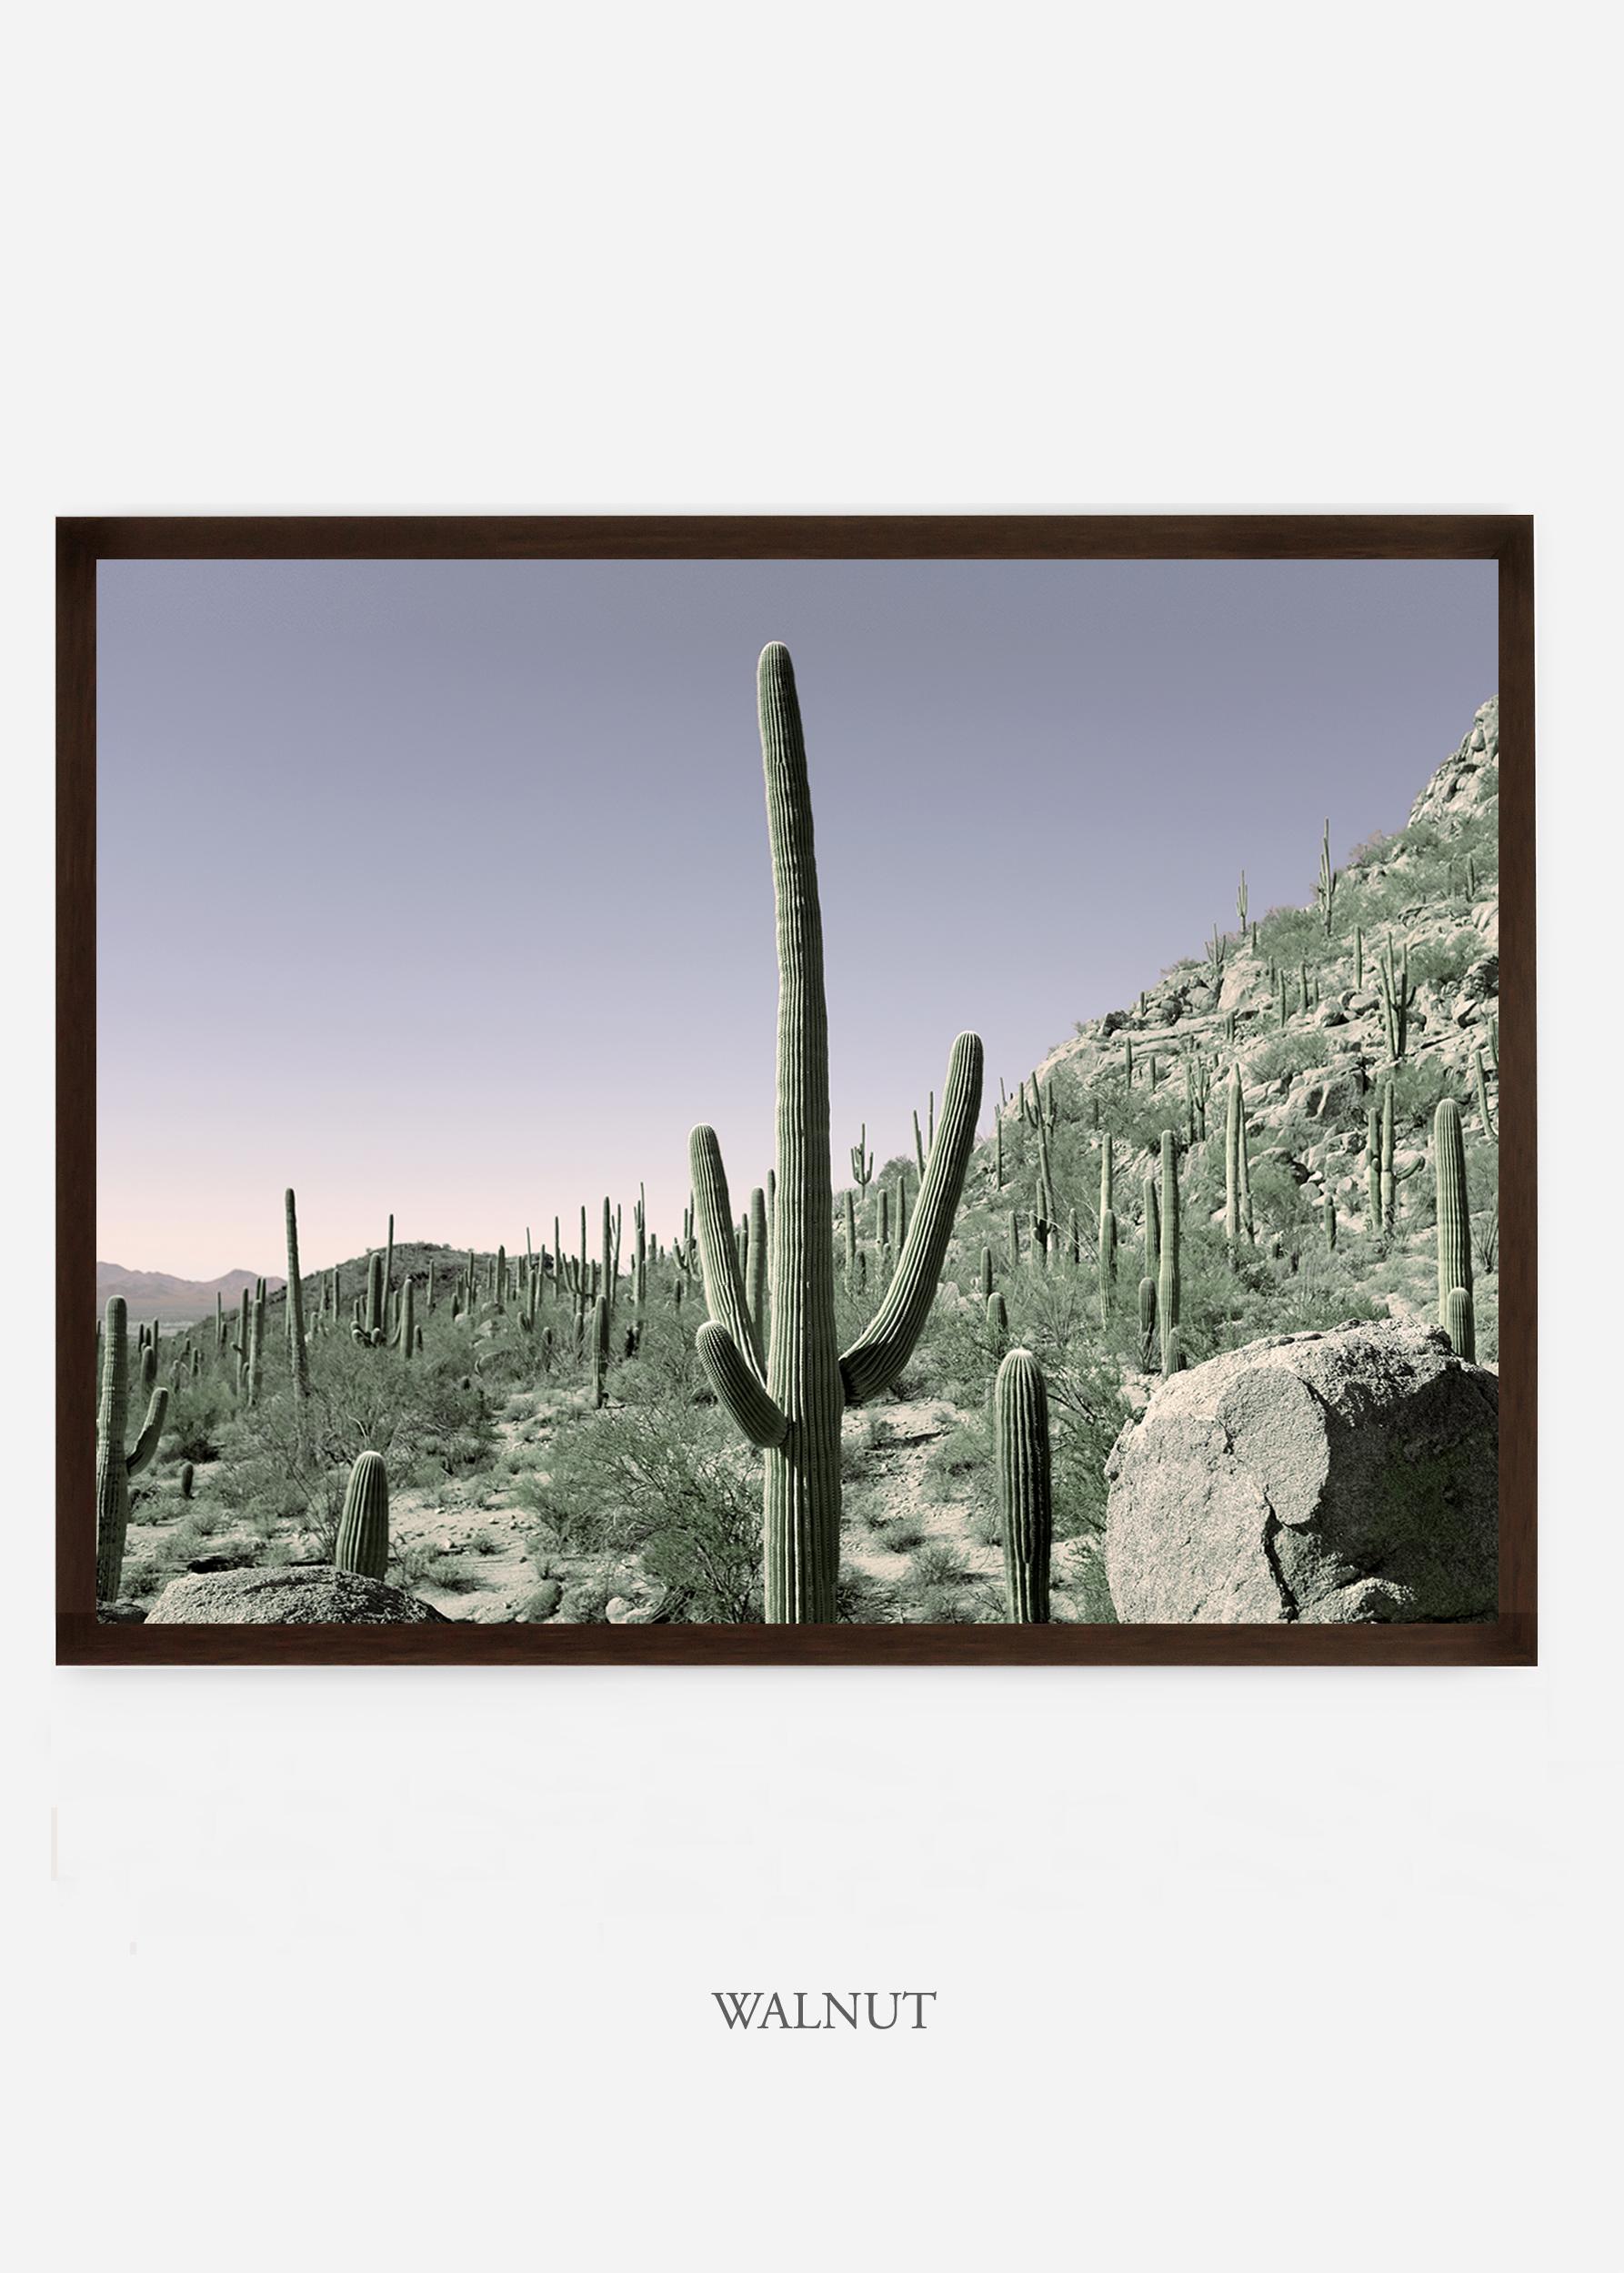 nomat_walnutframe-saguaroNo.13-wildercalifornia-art-wallart-cactusprint-homedecor-prints-arizona-botanical-artwork-interiordesign.jpg